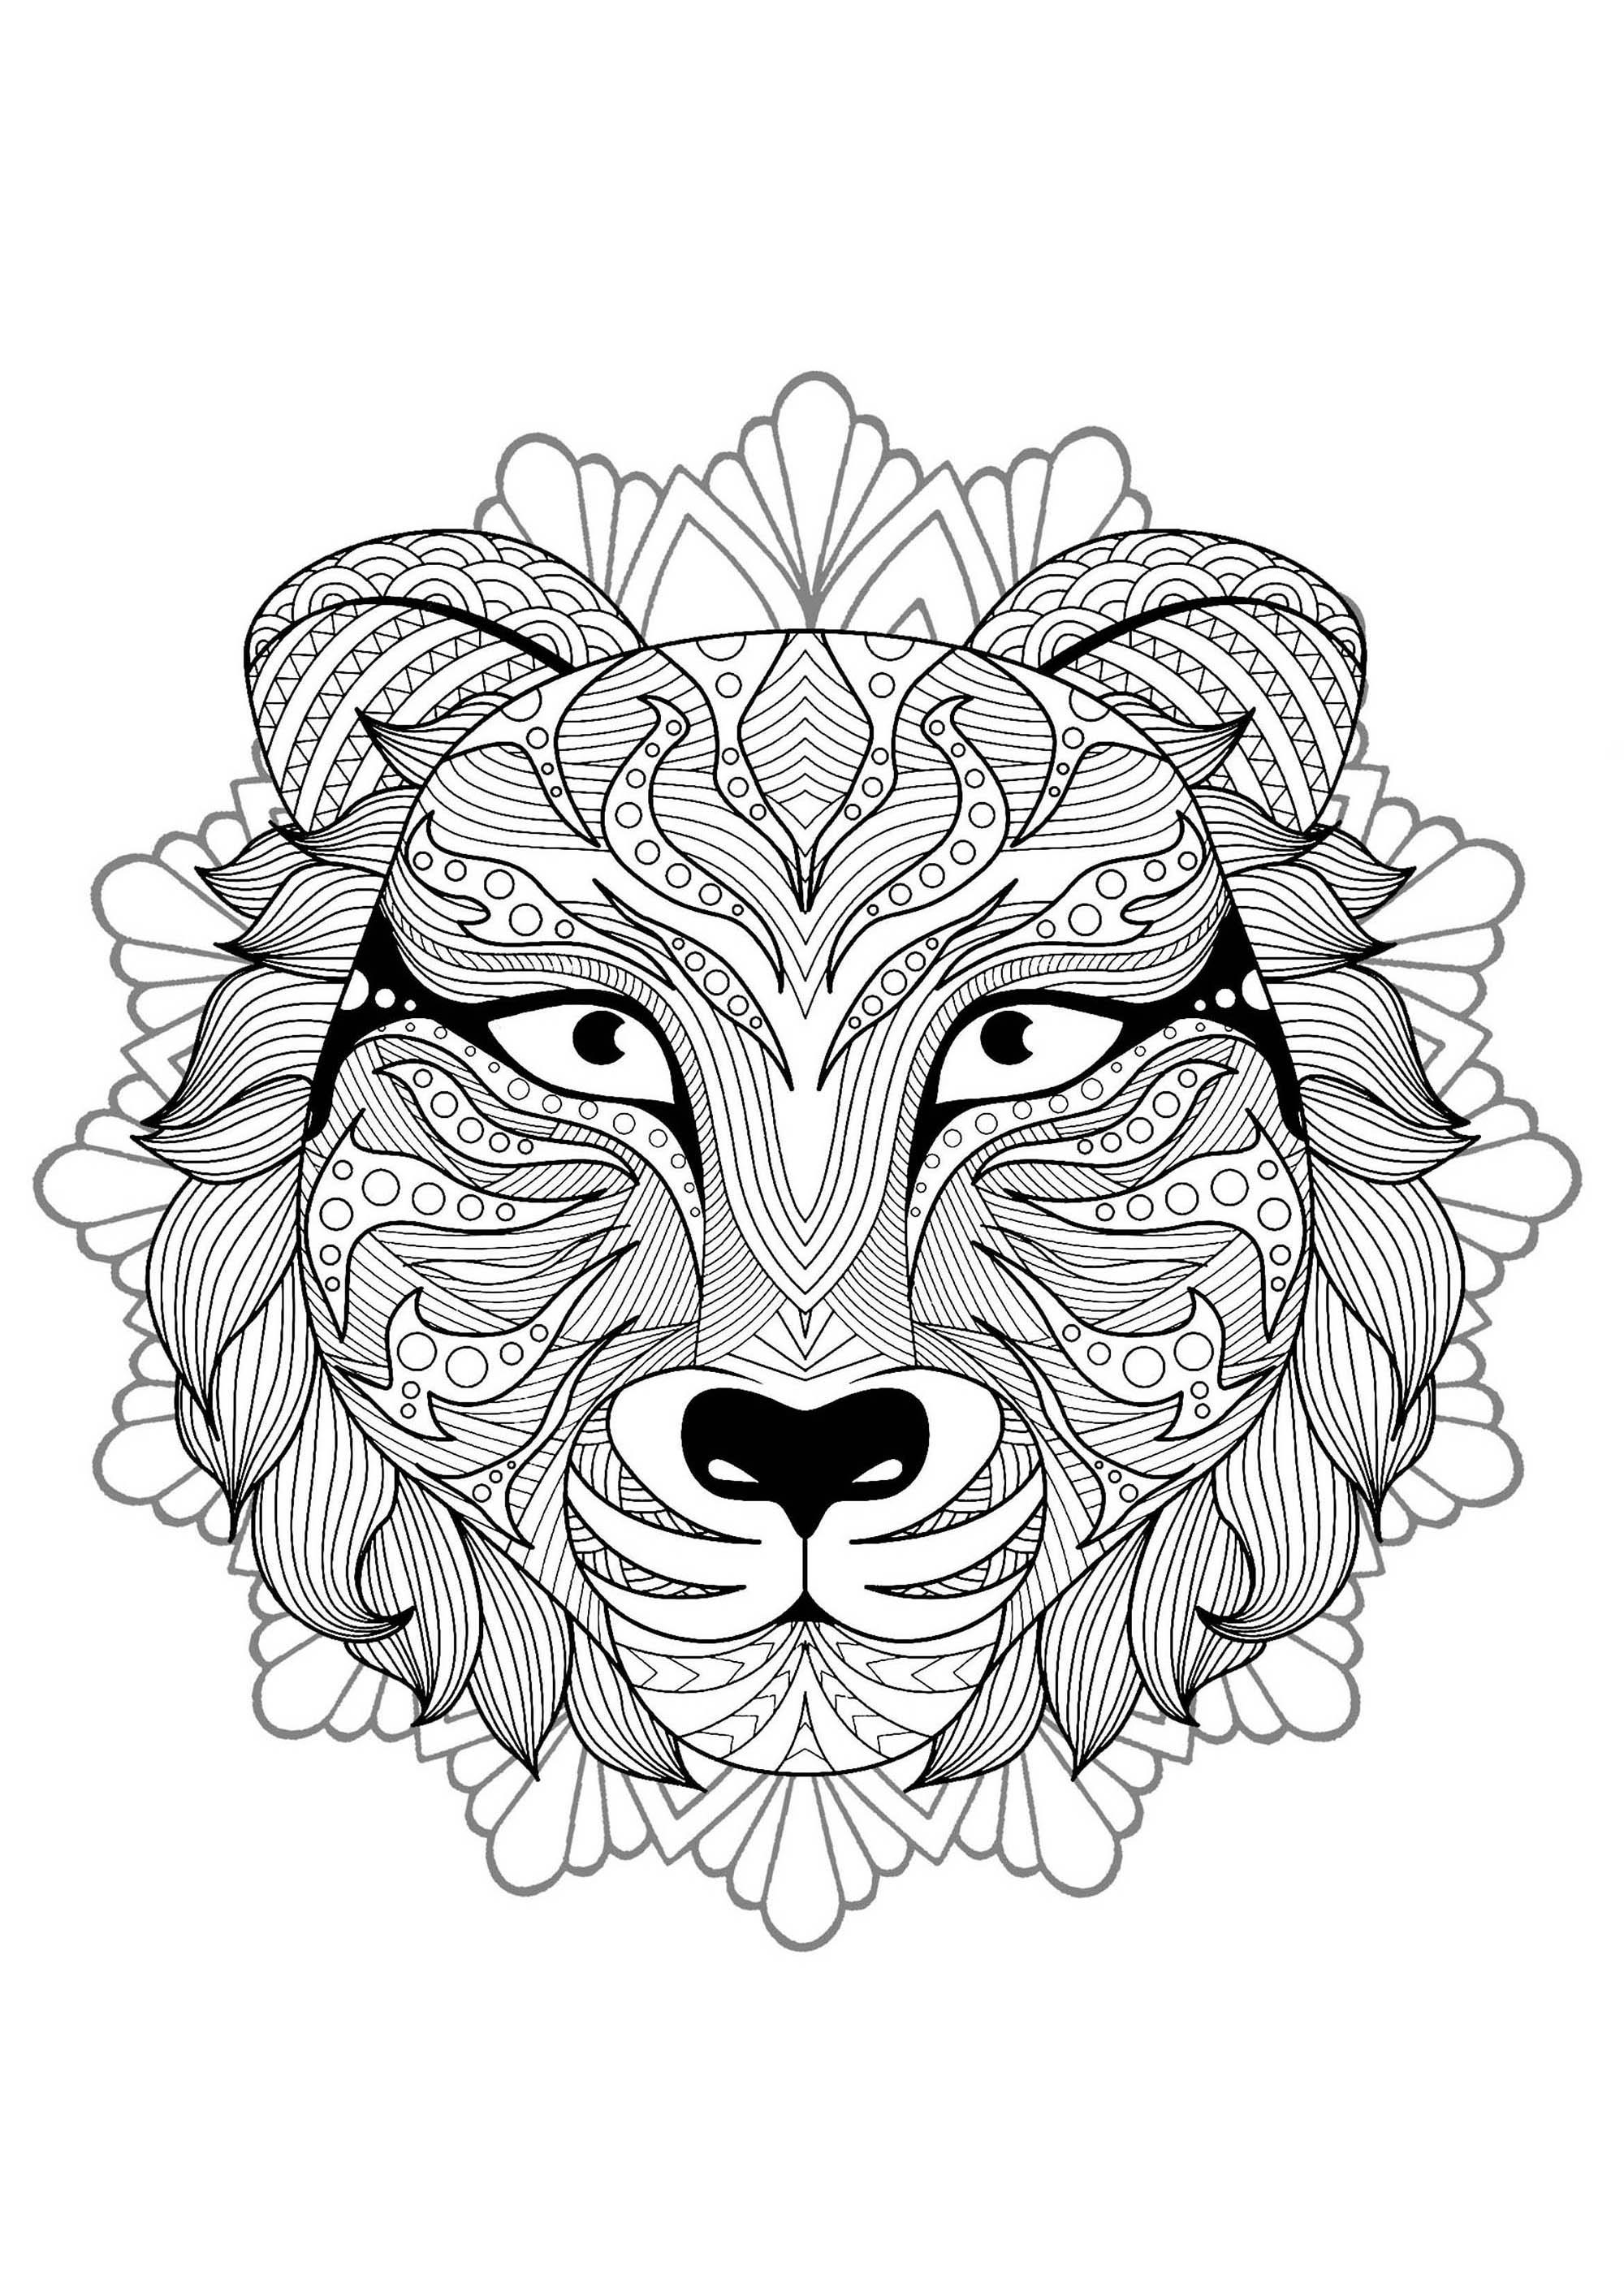 Mandala Tete Tigre 3 - Mandalas - Coloriages Difficiles dedans Coloriage Mandala Adulte A Imprimer